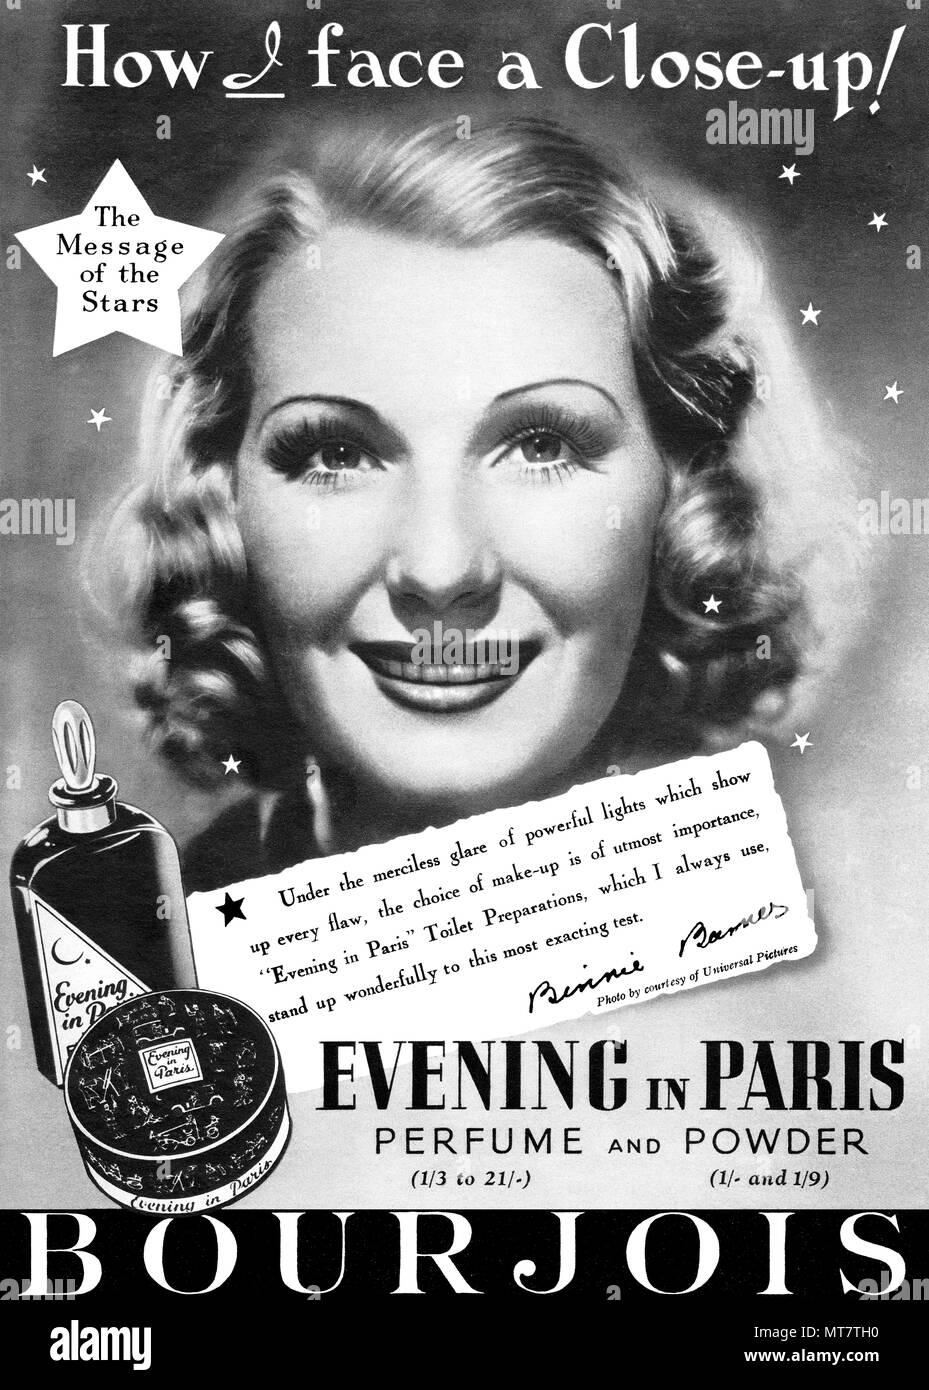 1939 British advertisement for Bourjois Evening In Paris perfume and powder, featuring actress Binnie Barnes. - Stock Image